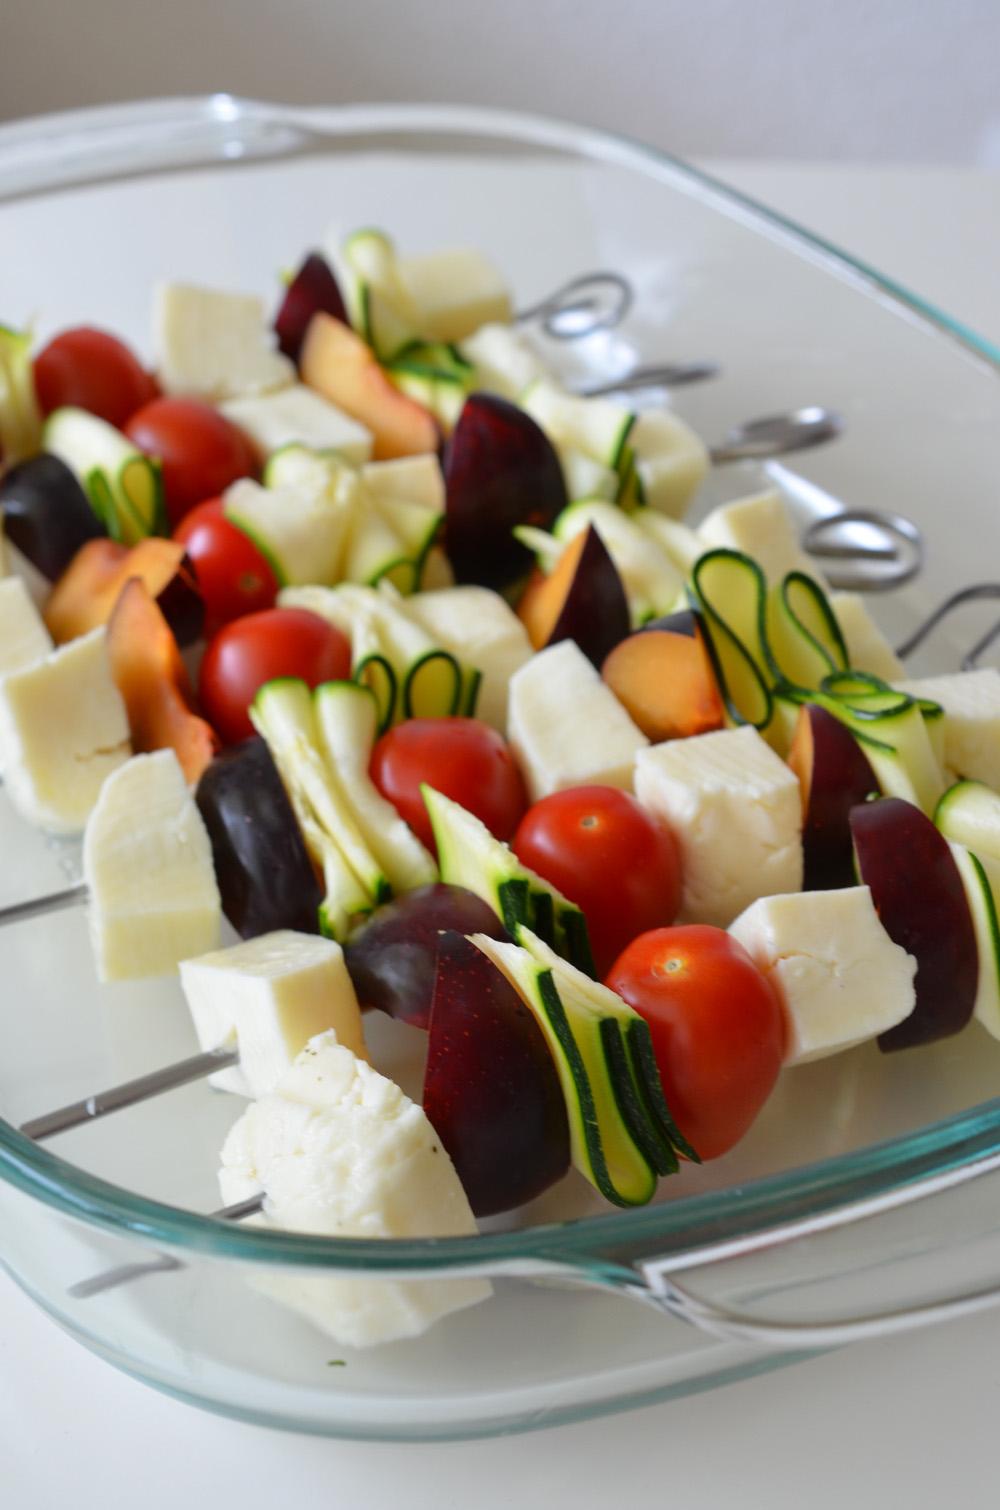 linsen zwetschgen salat mit feta rezepte suchen. Black Bedroom Furniture Sets. Home Design Ideas